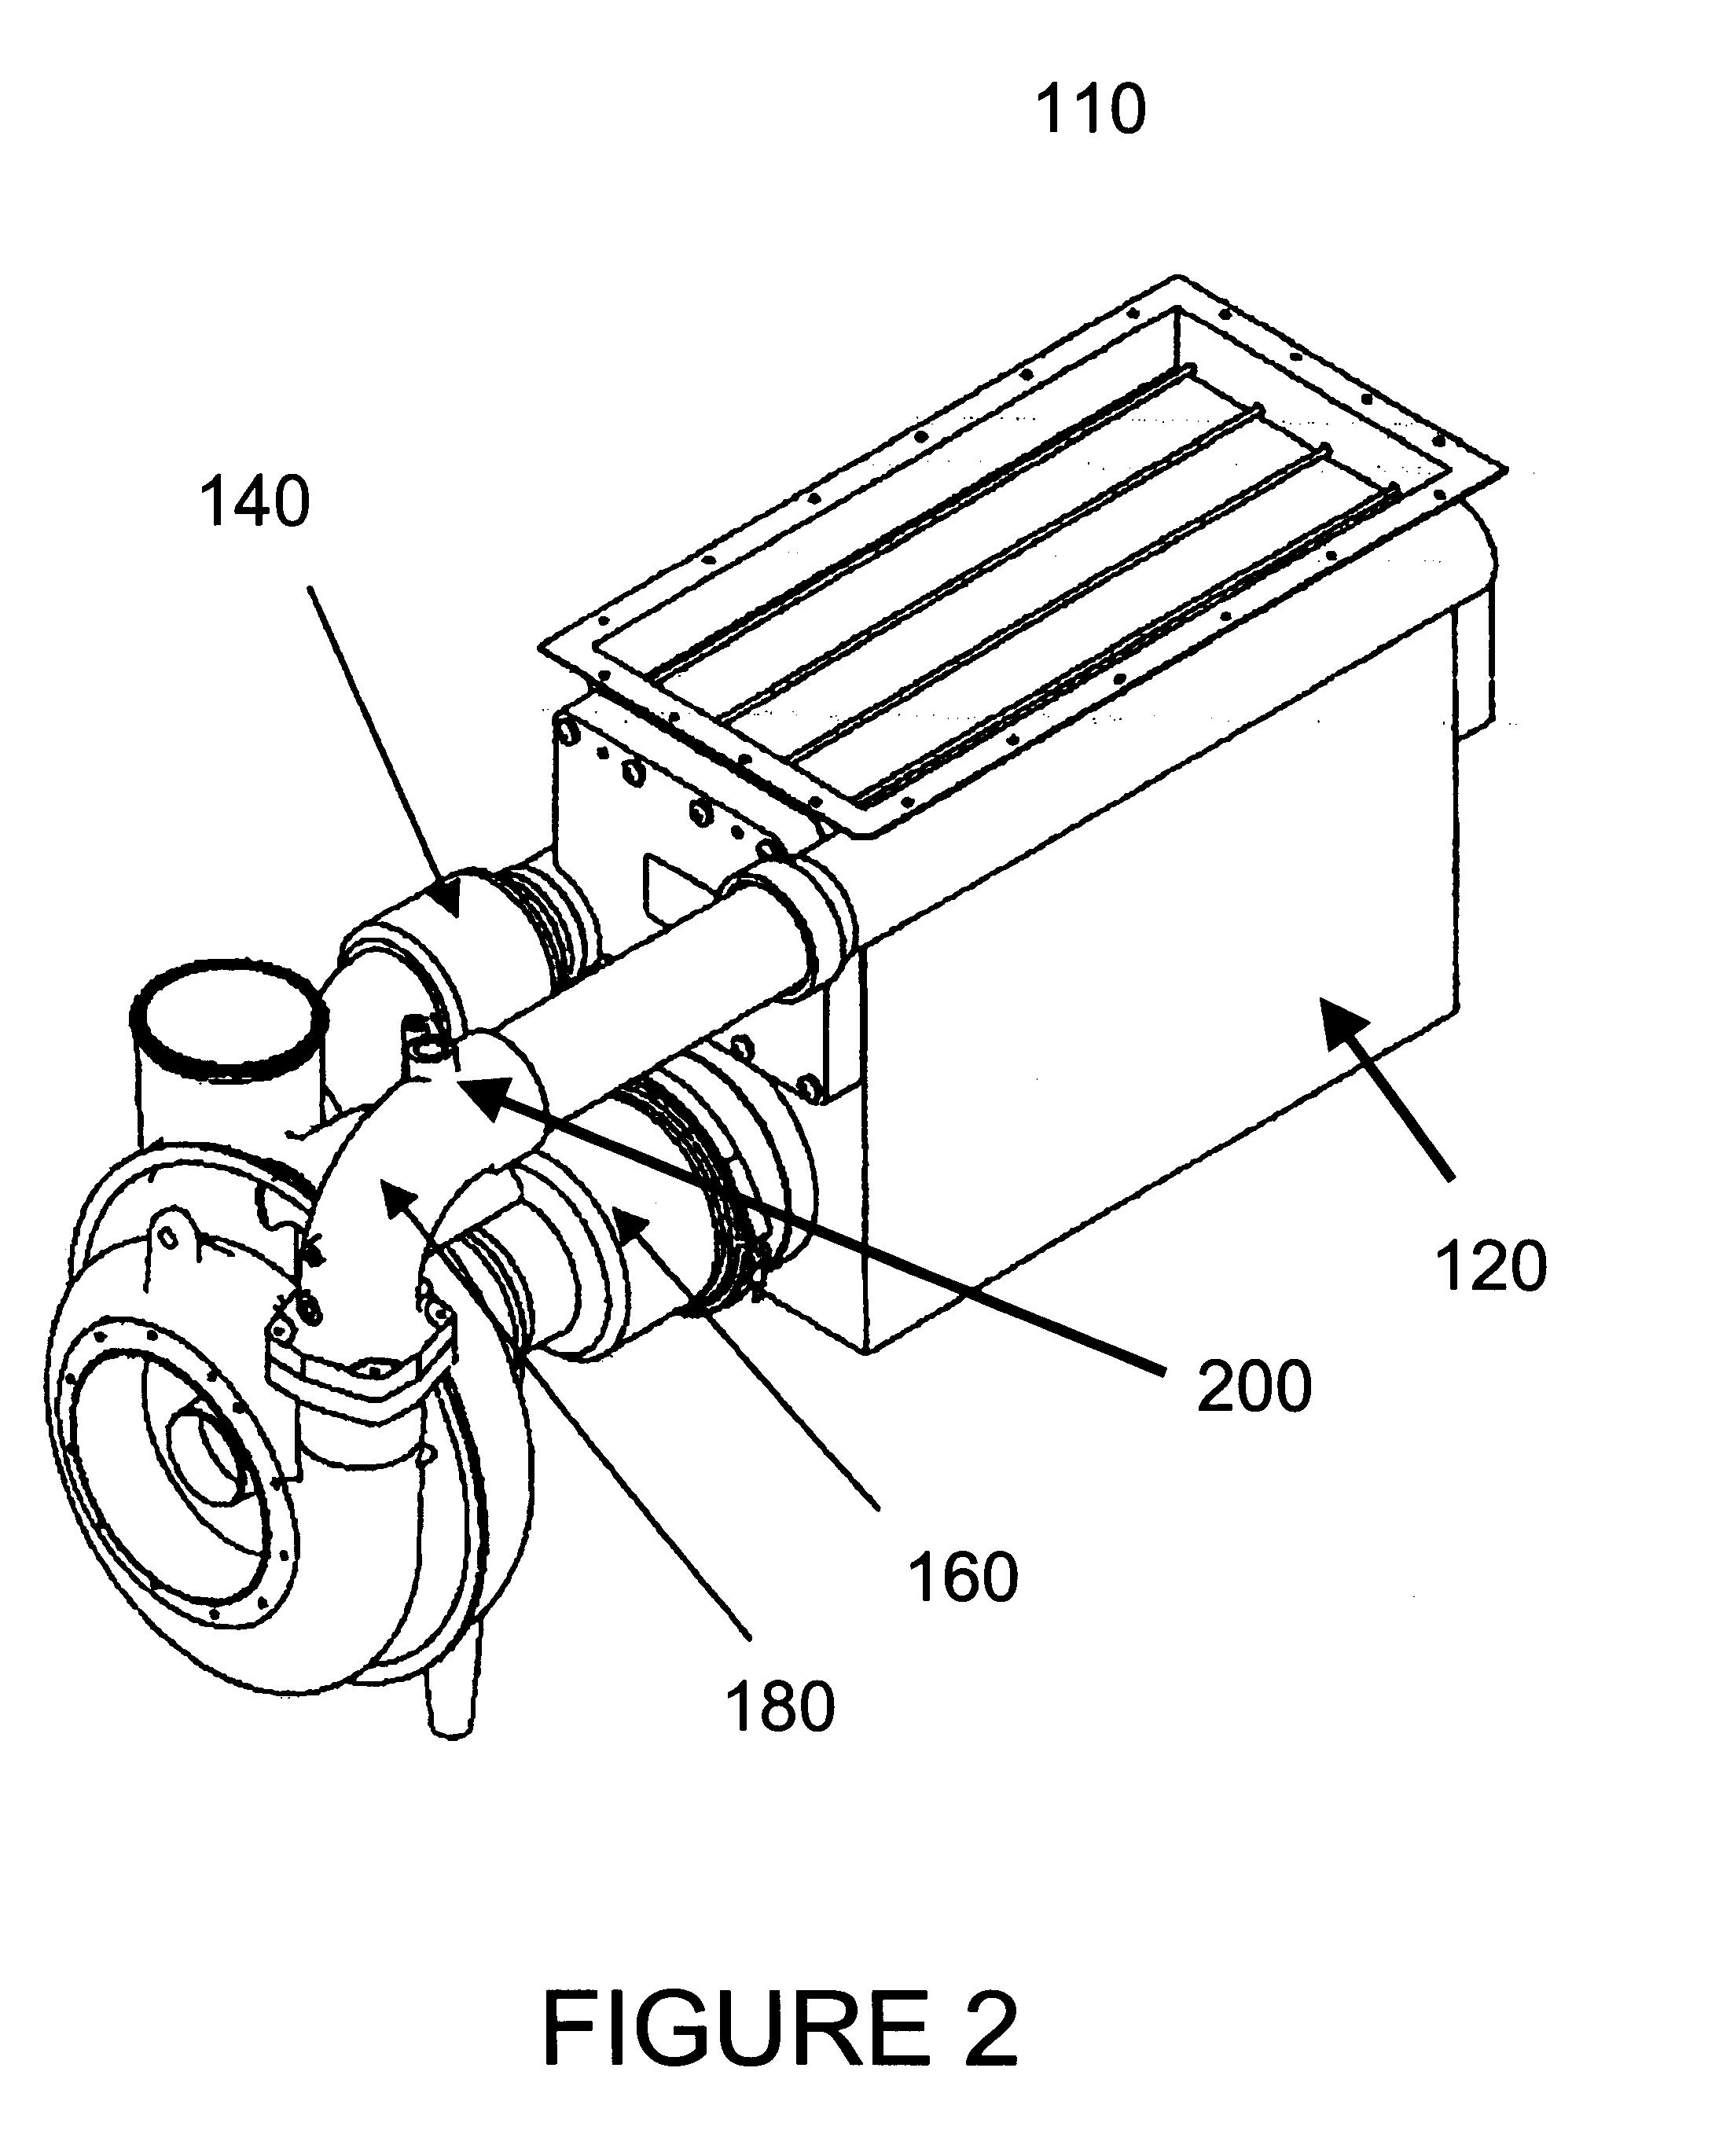 Best Inverter Generator further 207300 also Coleman Generator 4000 Diagram in addition Honeywell 7800 Wiring Diagram further US6463730. on honeywell generators